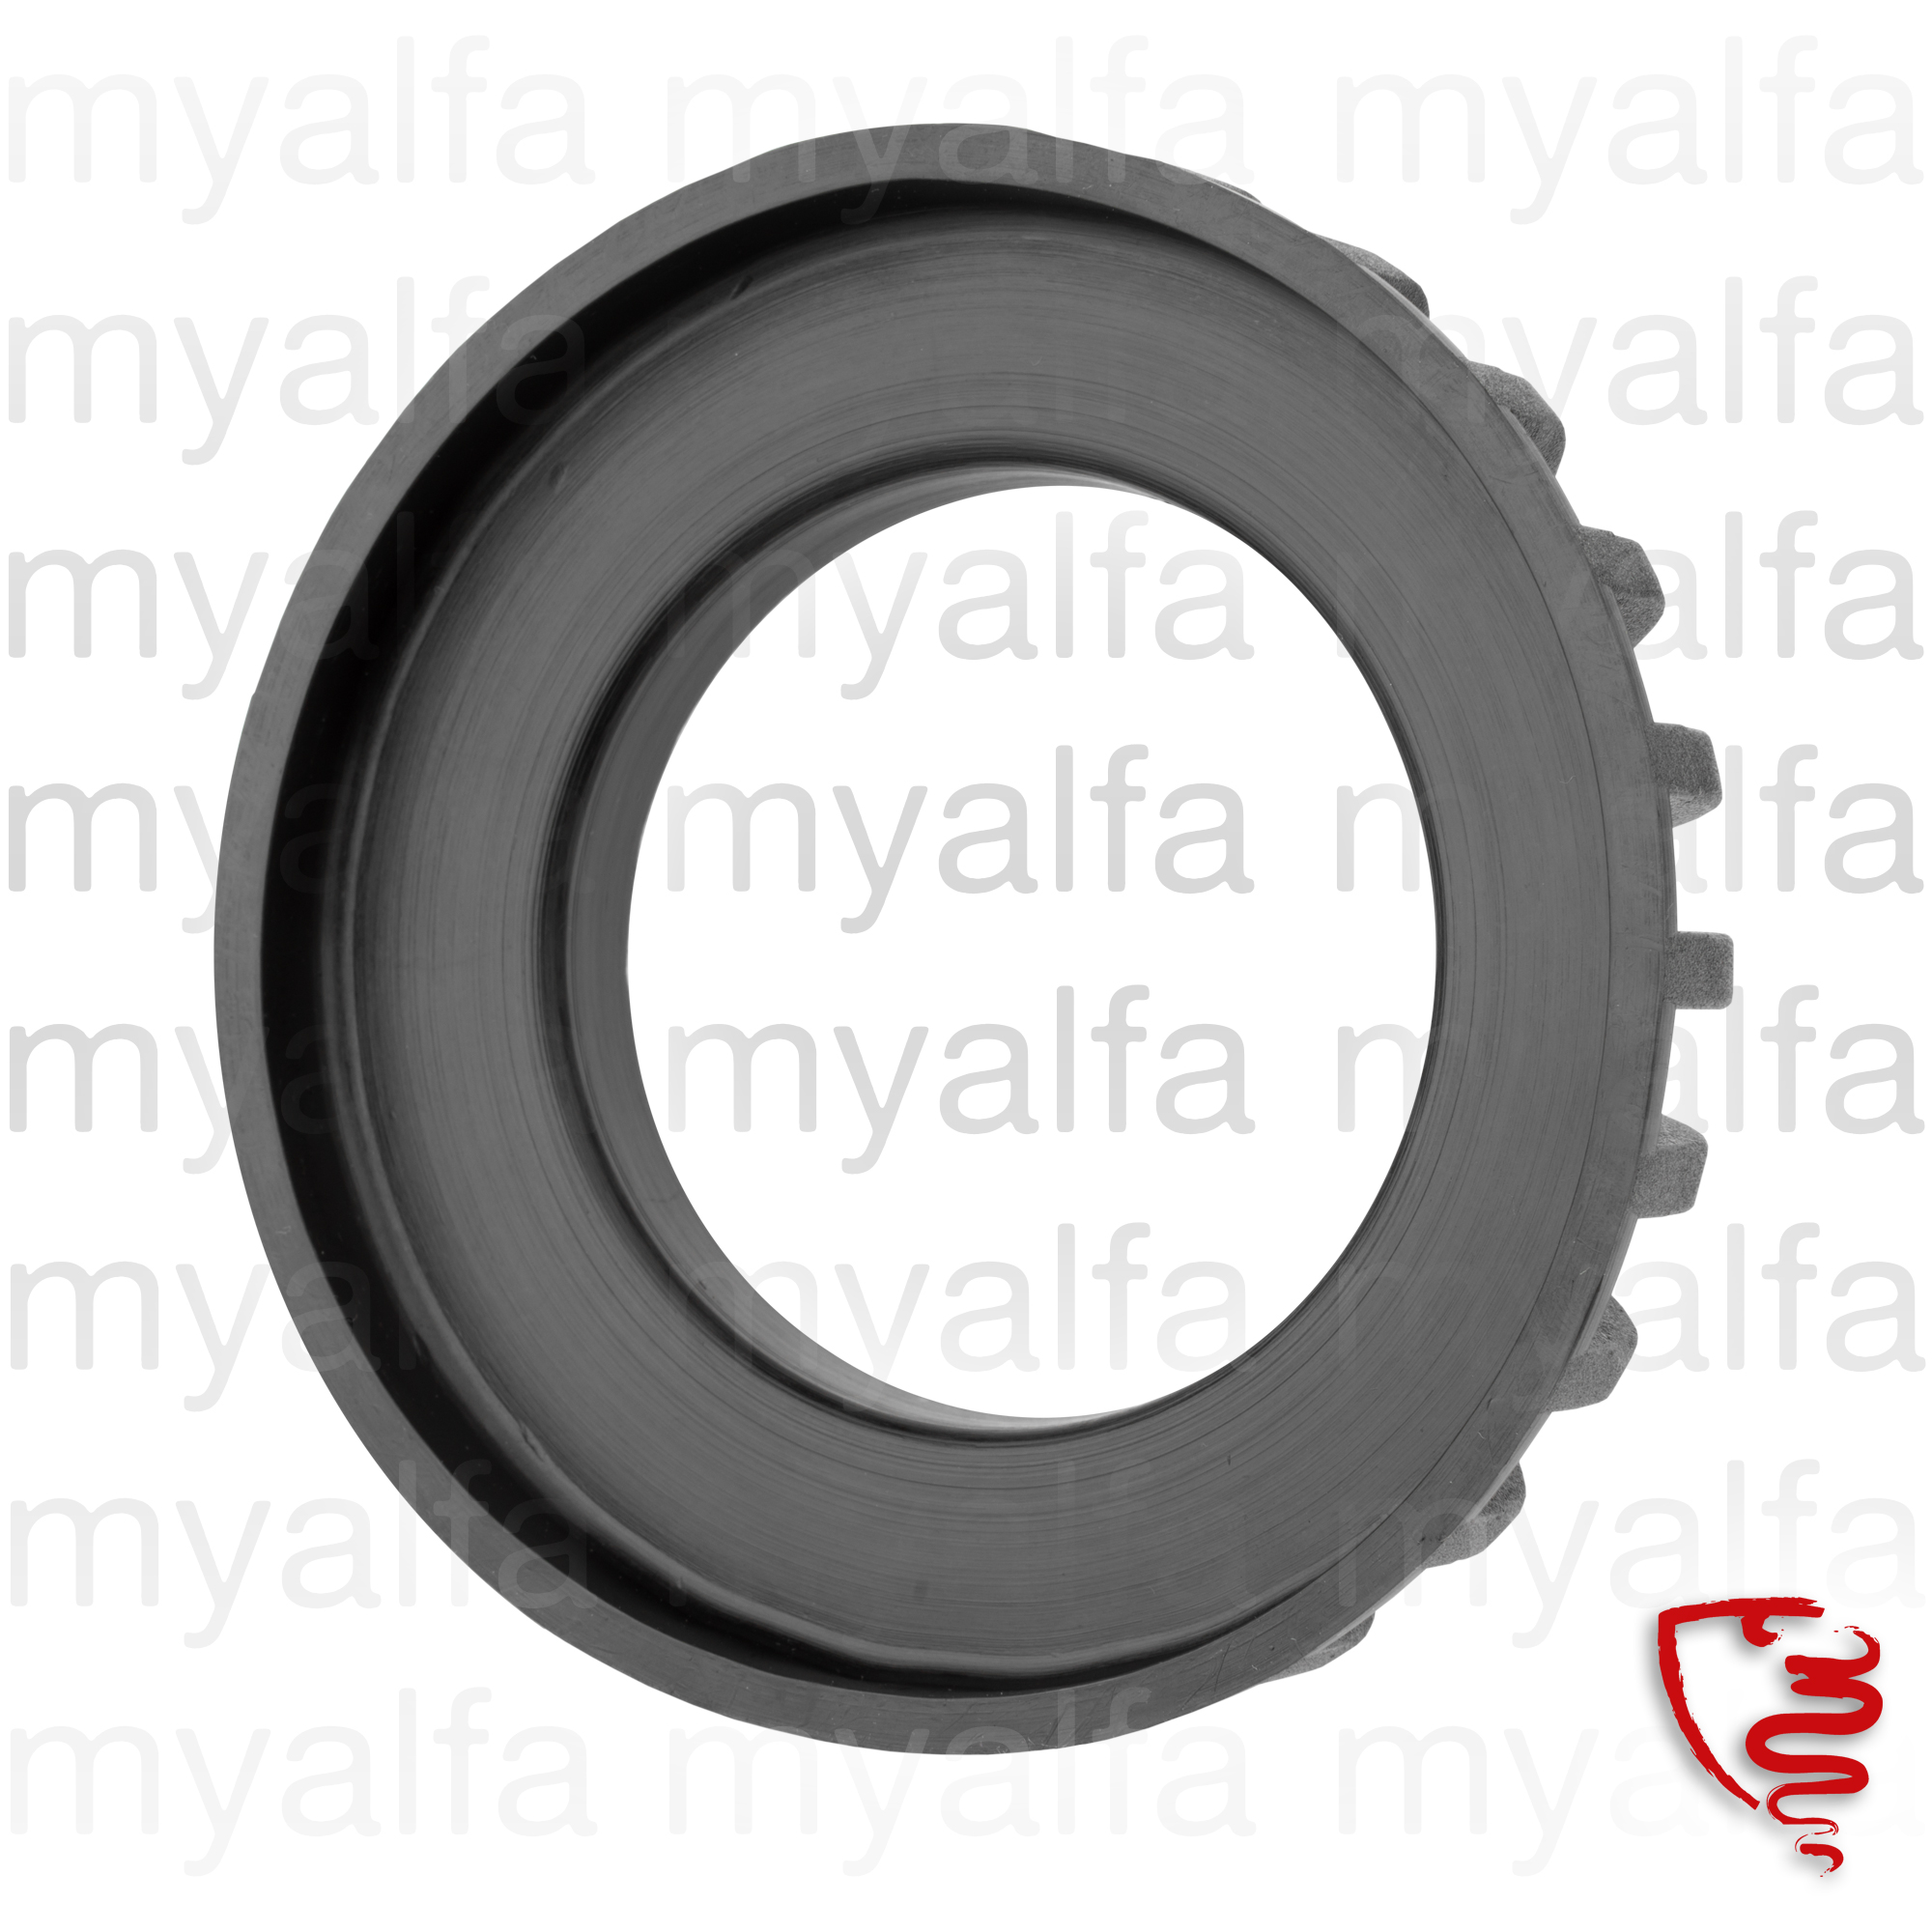 suspension spring rubber back - Superior for 105/115, Chassis Mount, Rear suspension, Springs/Shocks